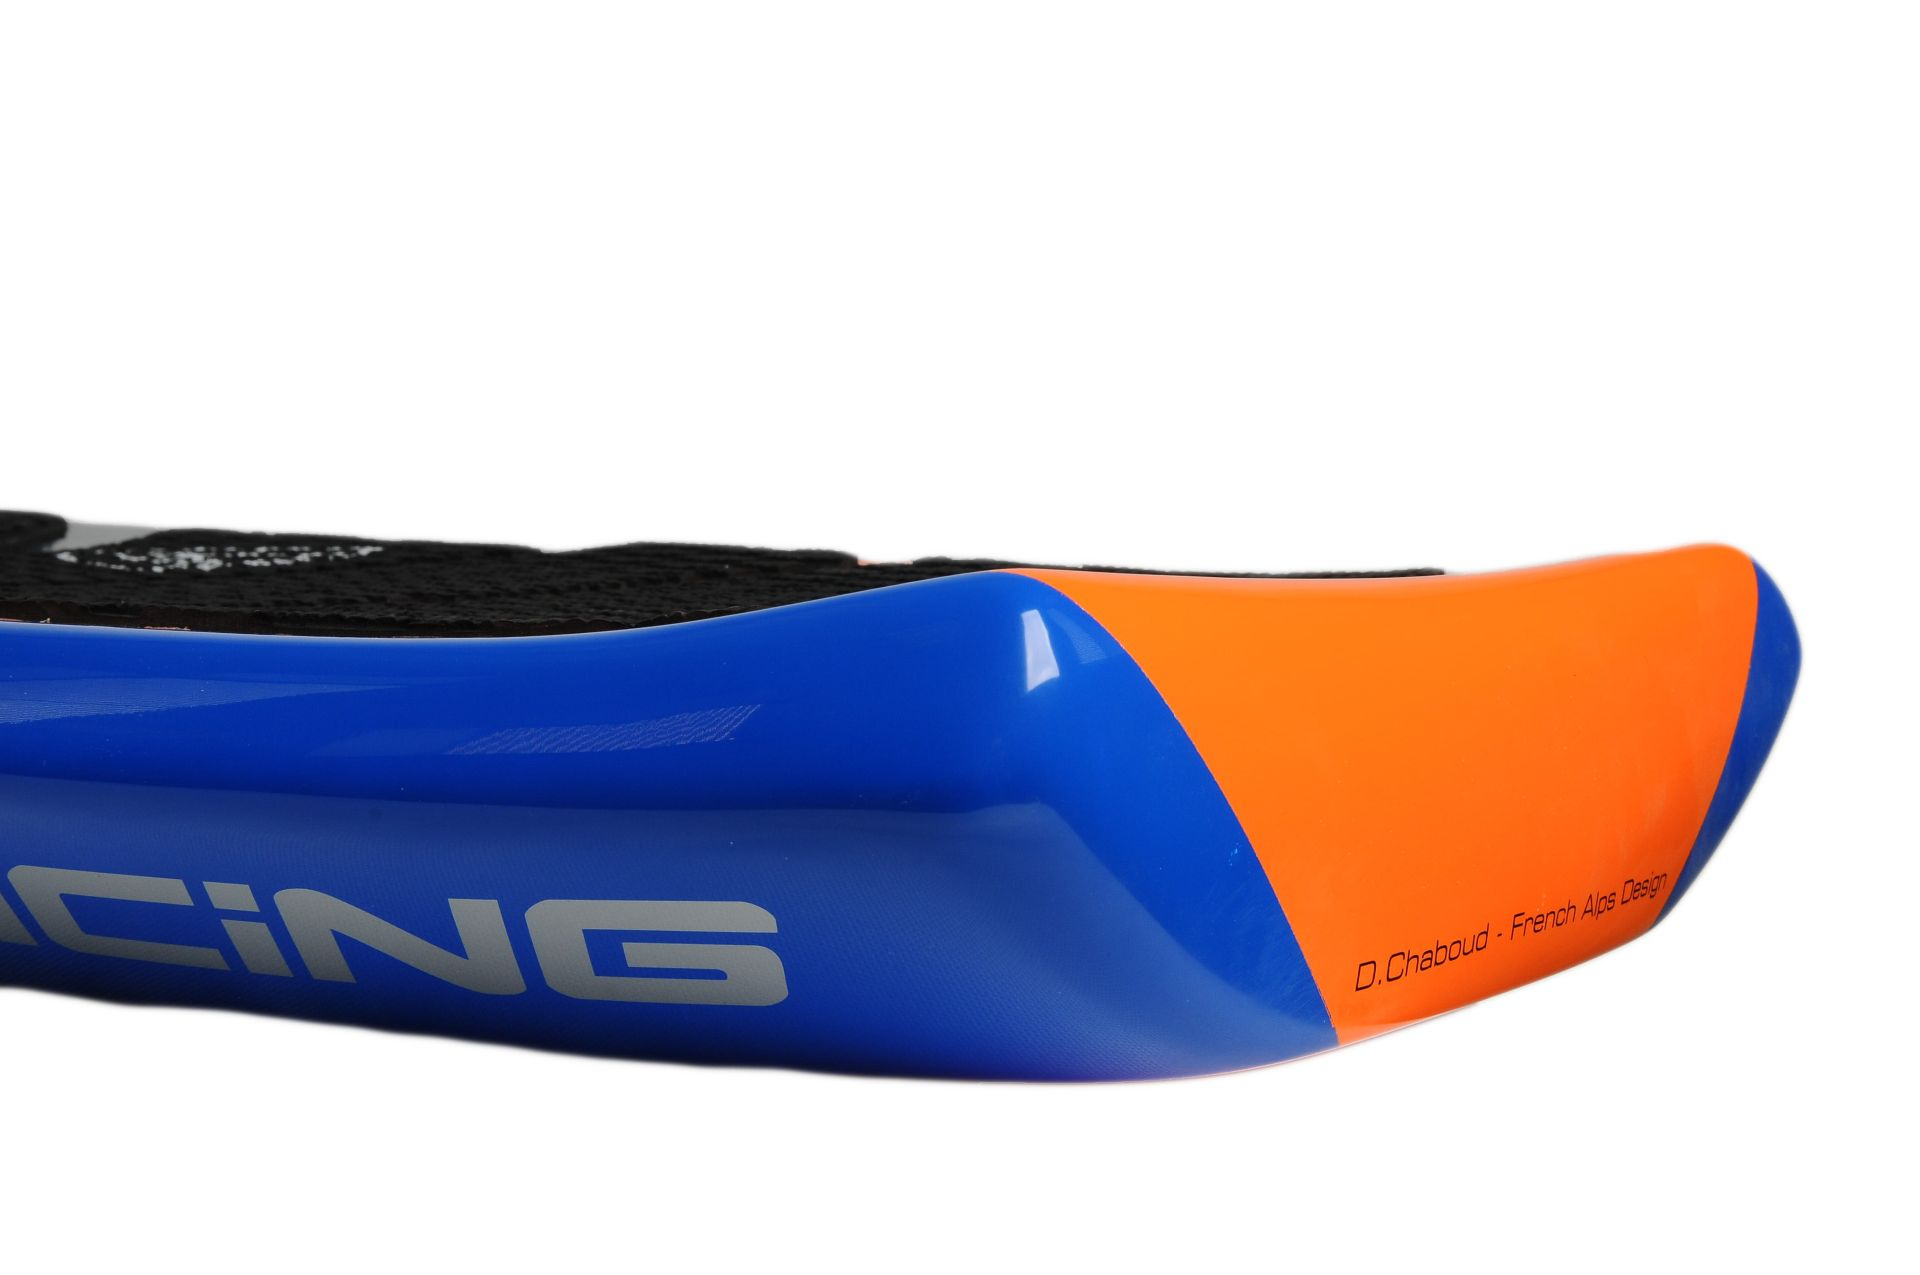 Kitefoil foilboard alpinefoil vr7 2 2